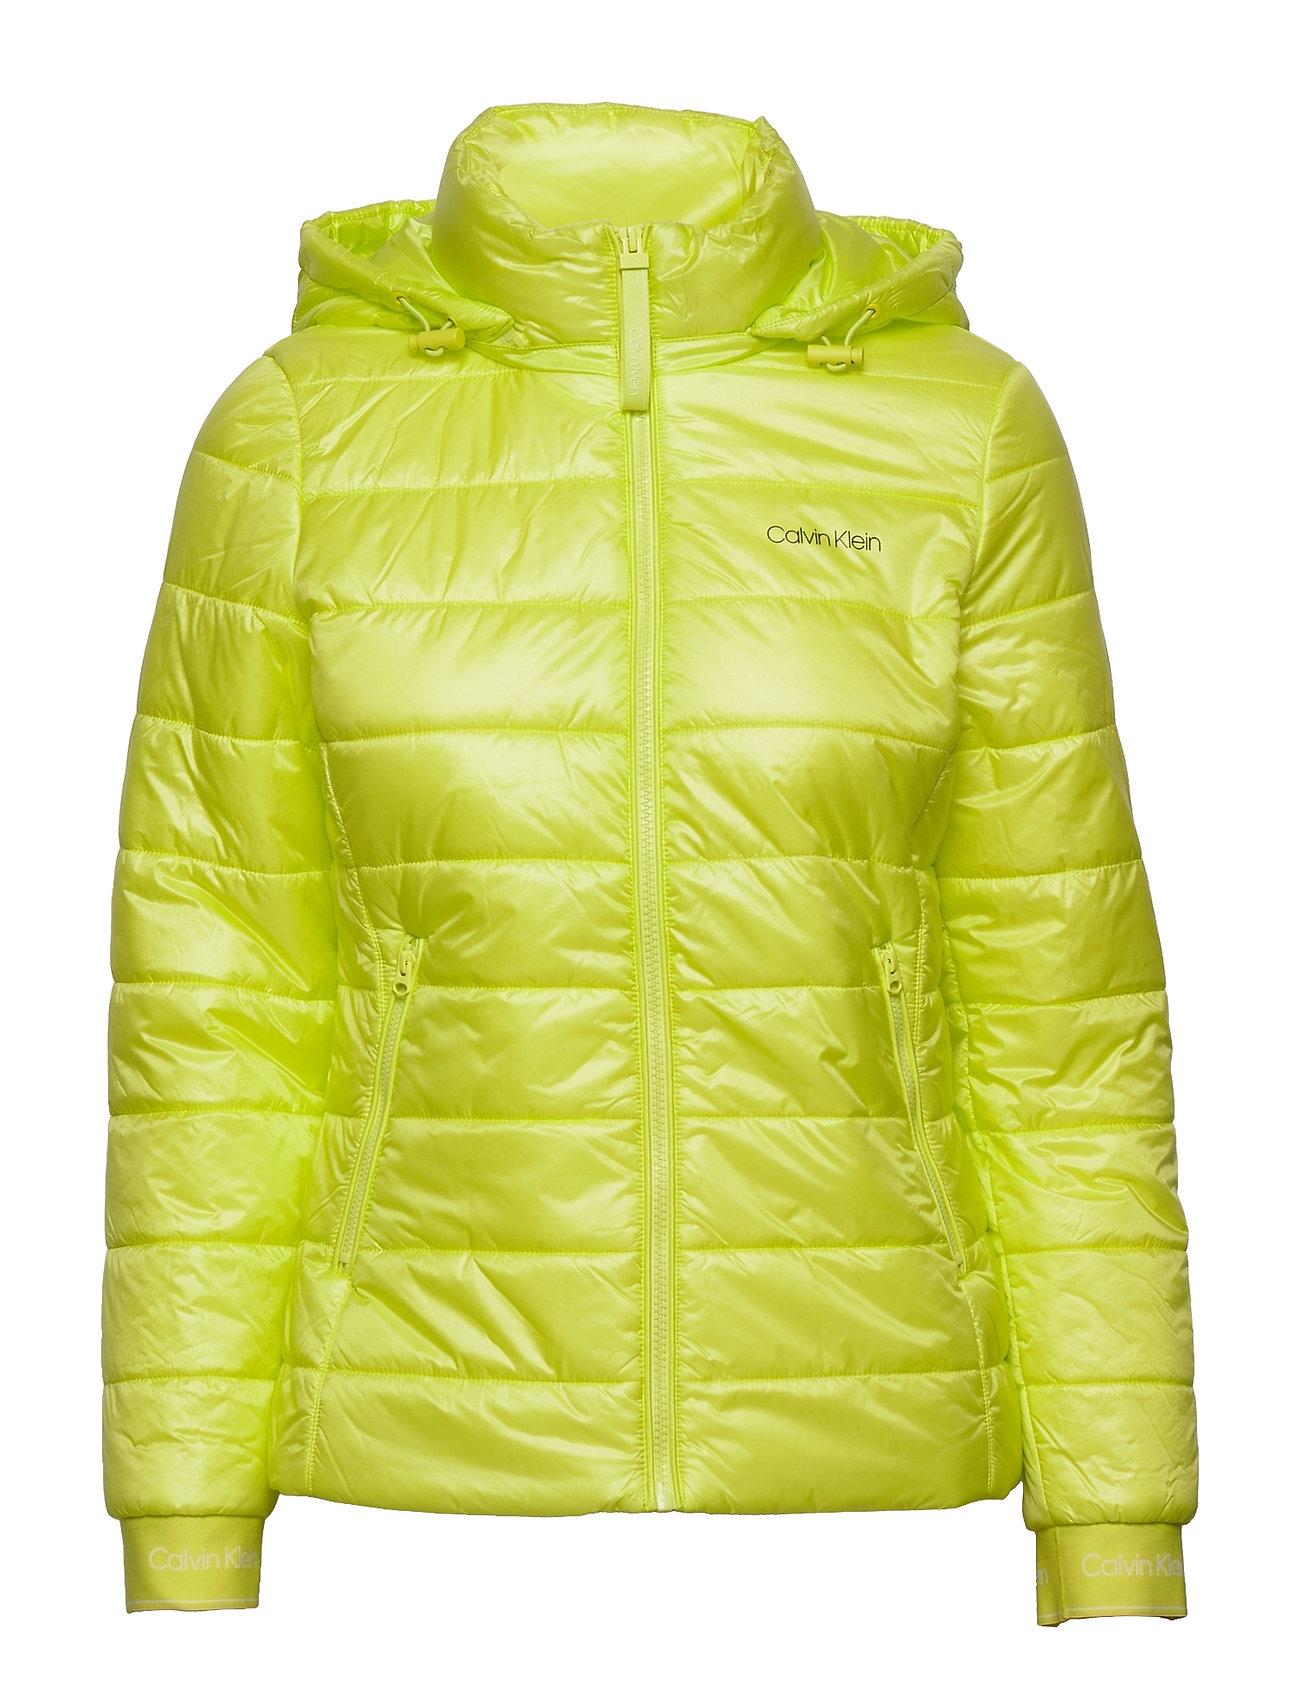 Essential Sorona Short Jacket Foret Jakke Grøn Calvin Klein